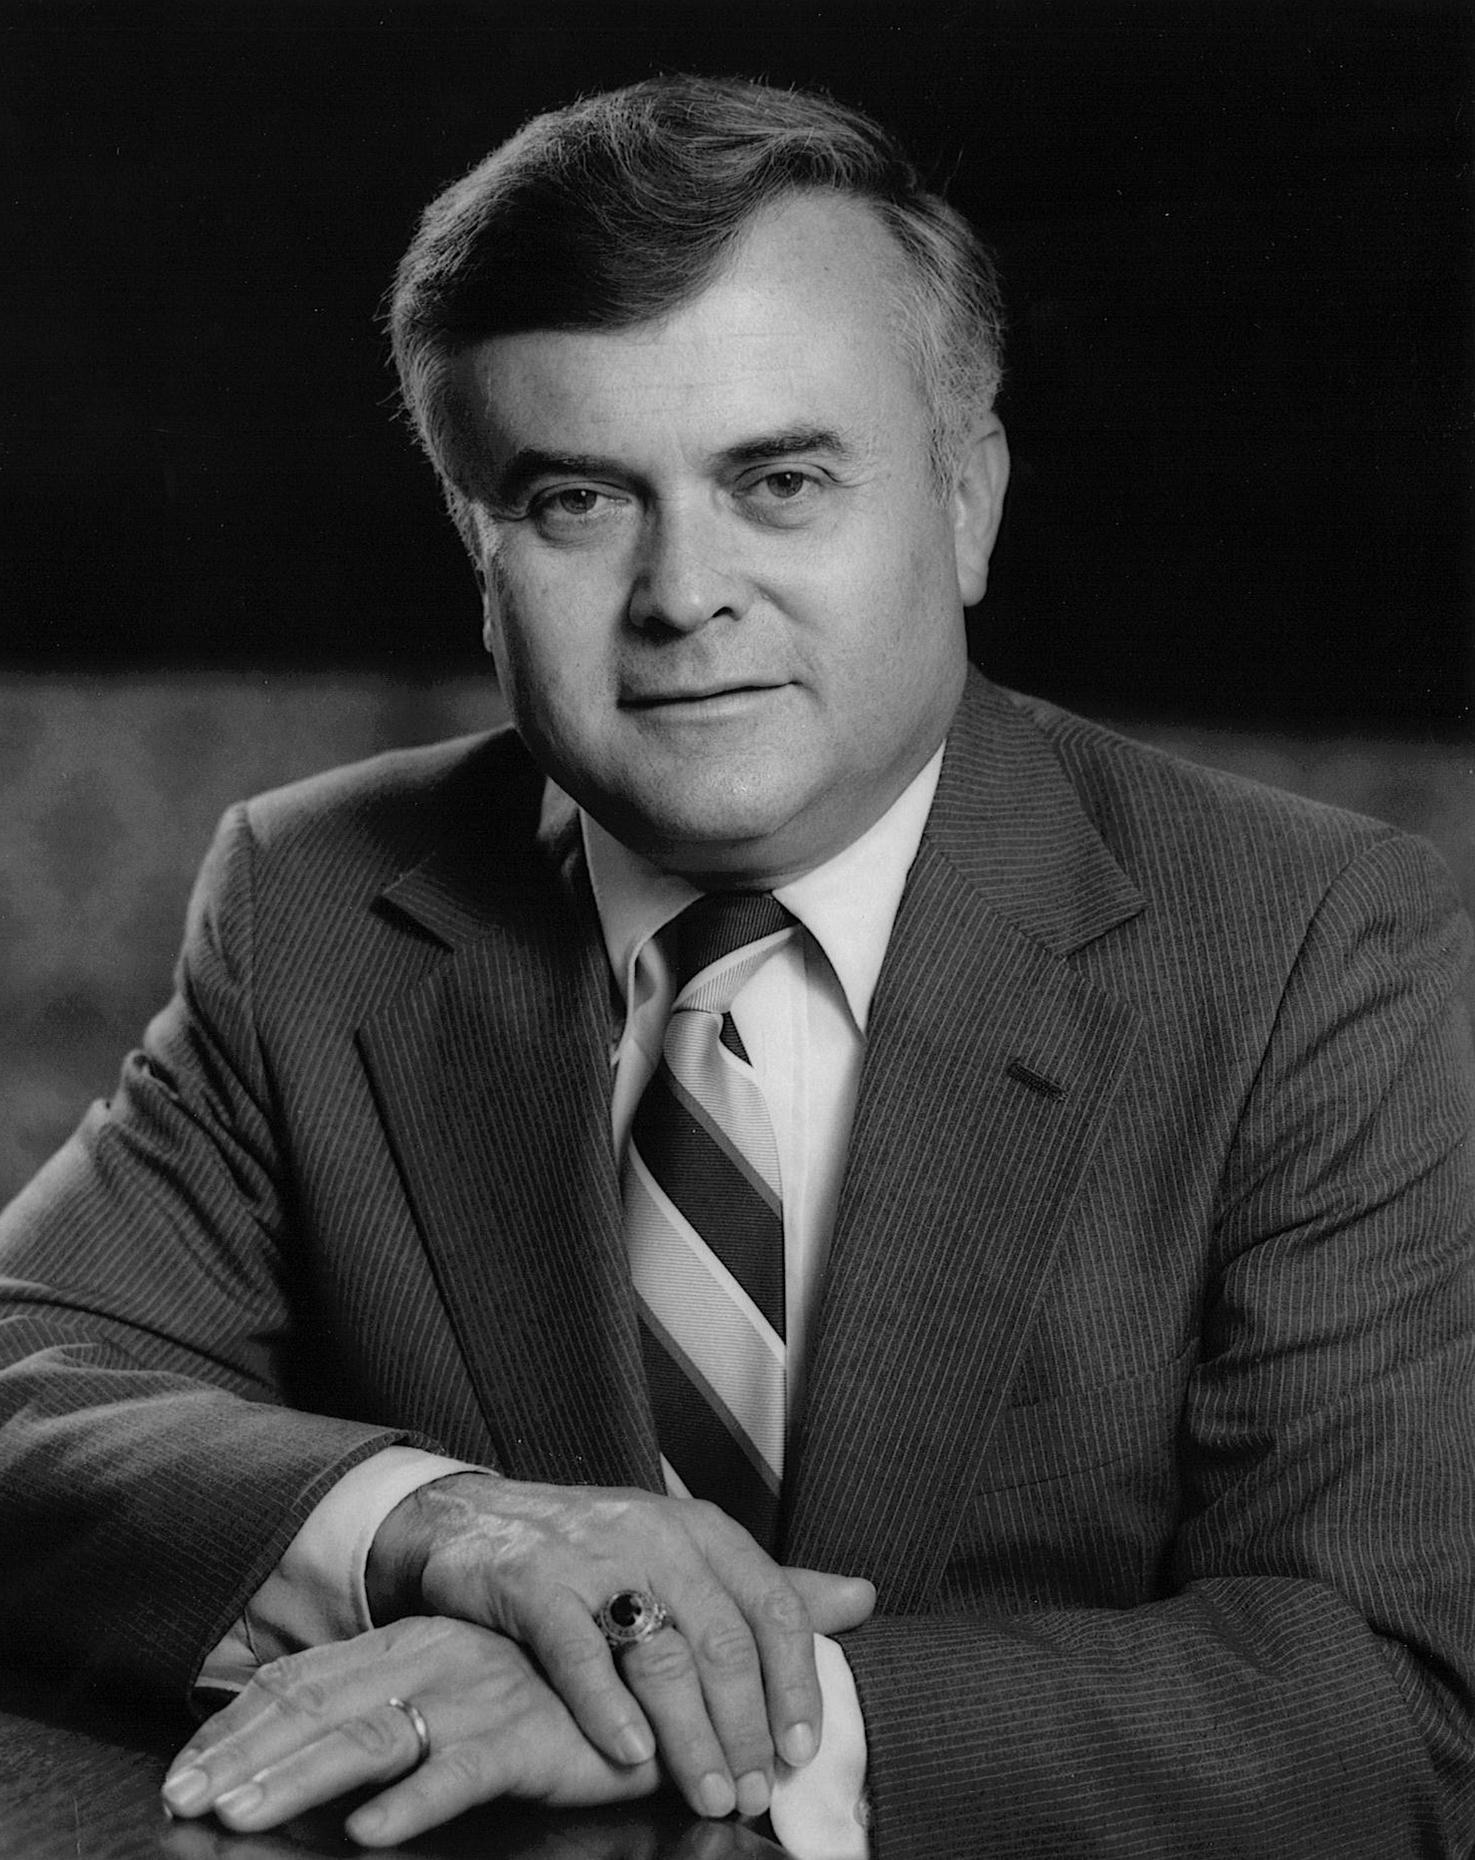 George Francis Knapp Jr '53